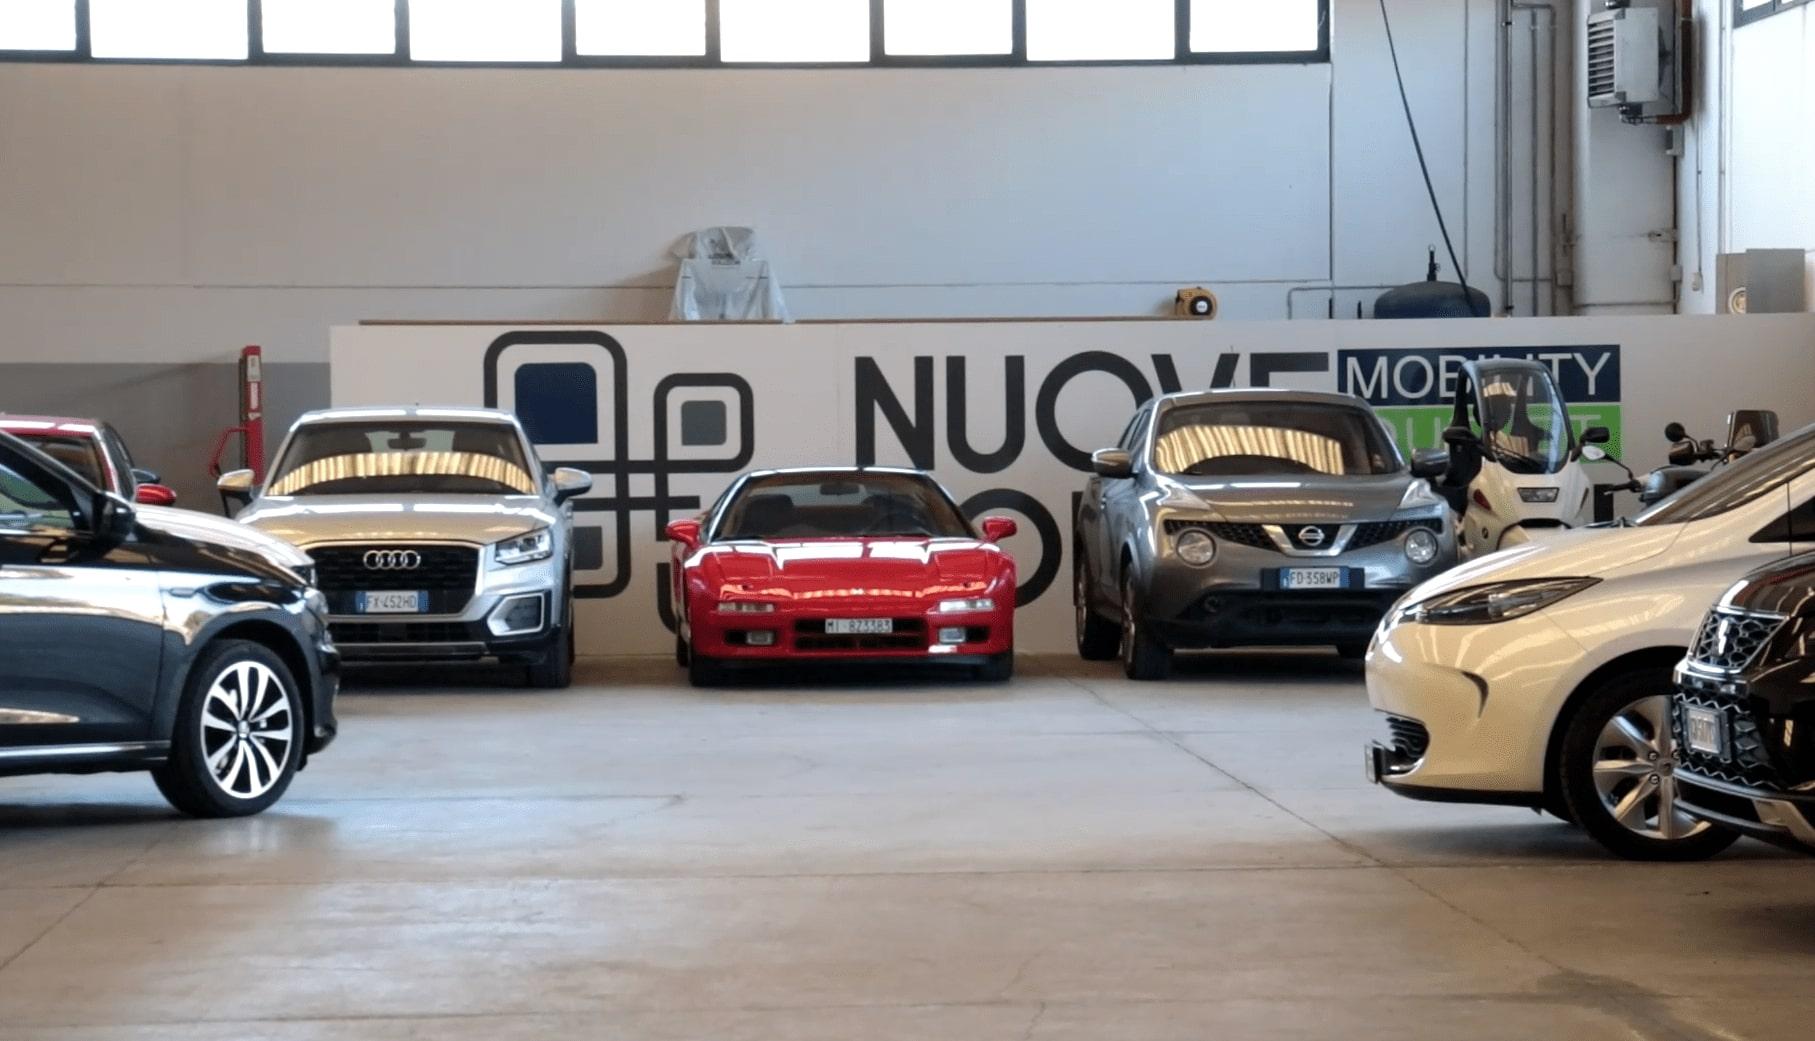 Nuove Soluzioni Auto Magnago